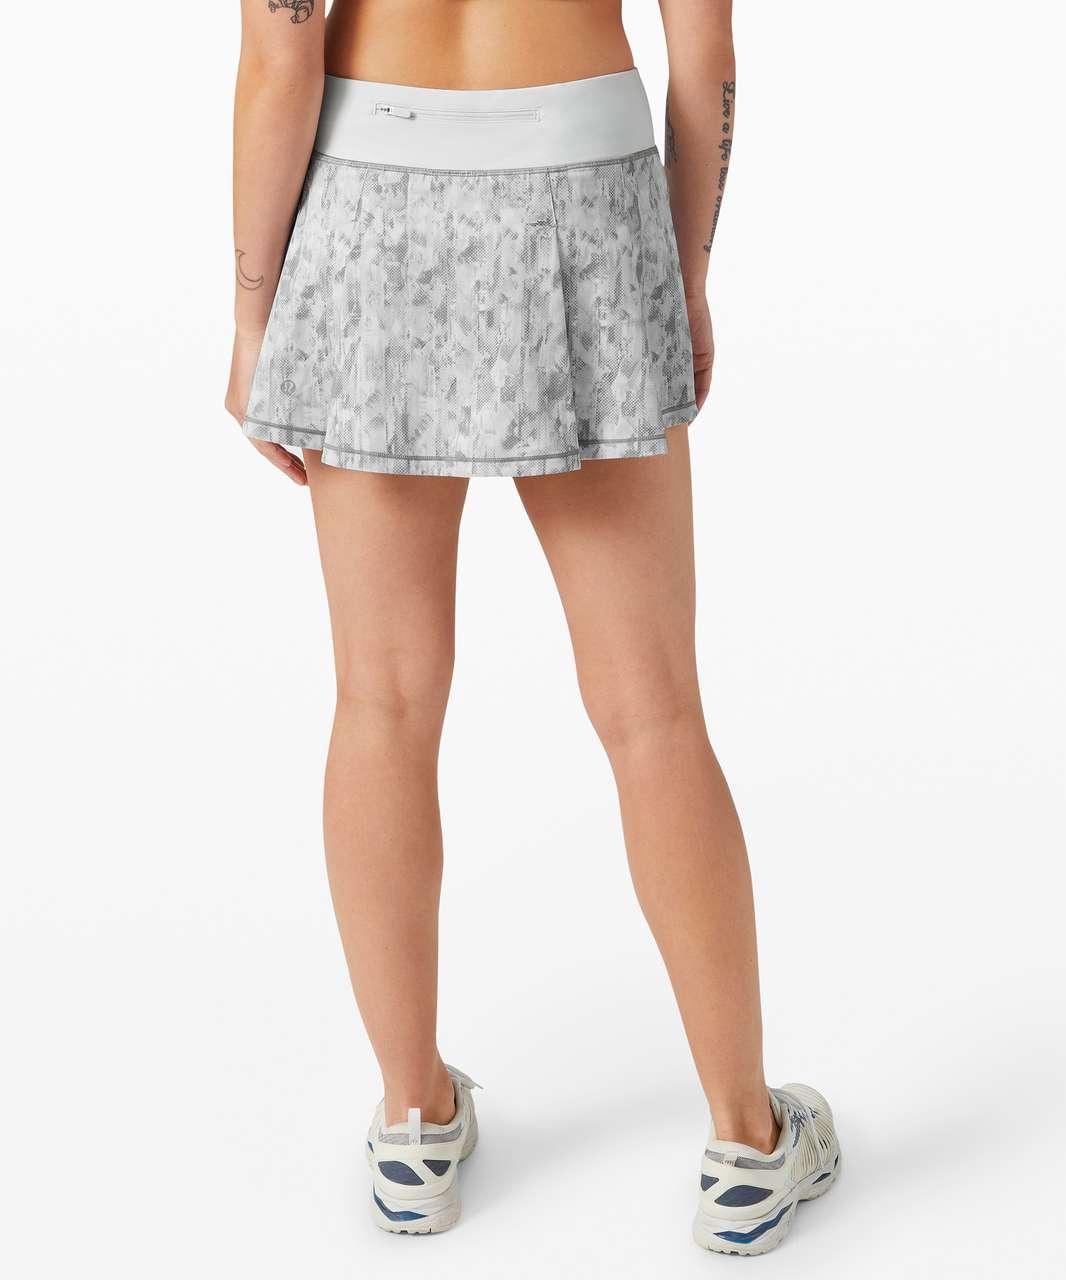 "Lululemon Pace Rival Skirt (Regular) *No Panels 13"" - City Breeze Alpine White Multi / Alpine White"